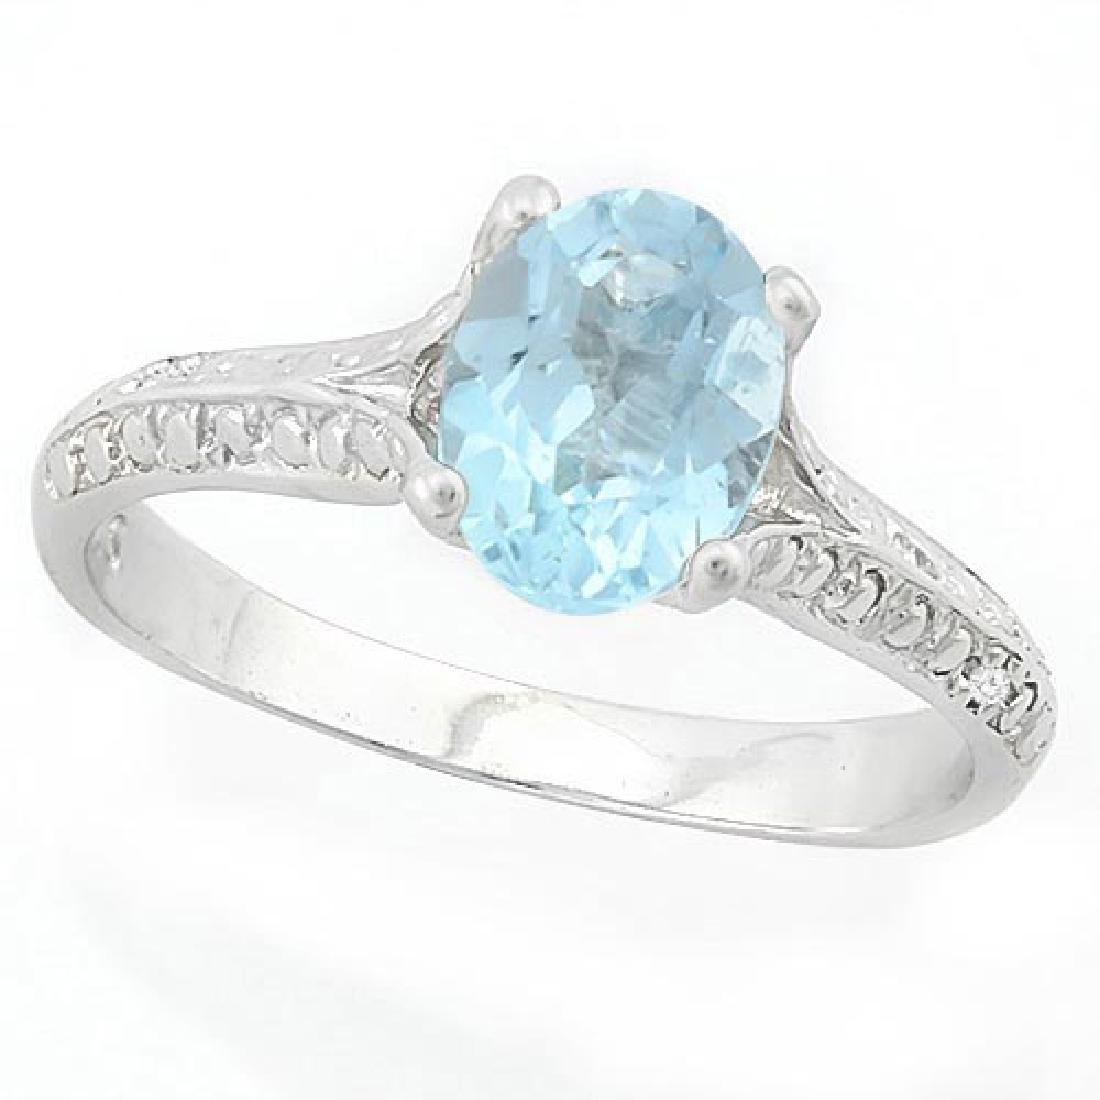 1 1/3 CARAT BABY SWISS BLUE TOPAZ & DIAMOND 925 STERLIN